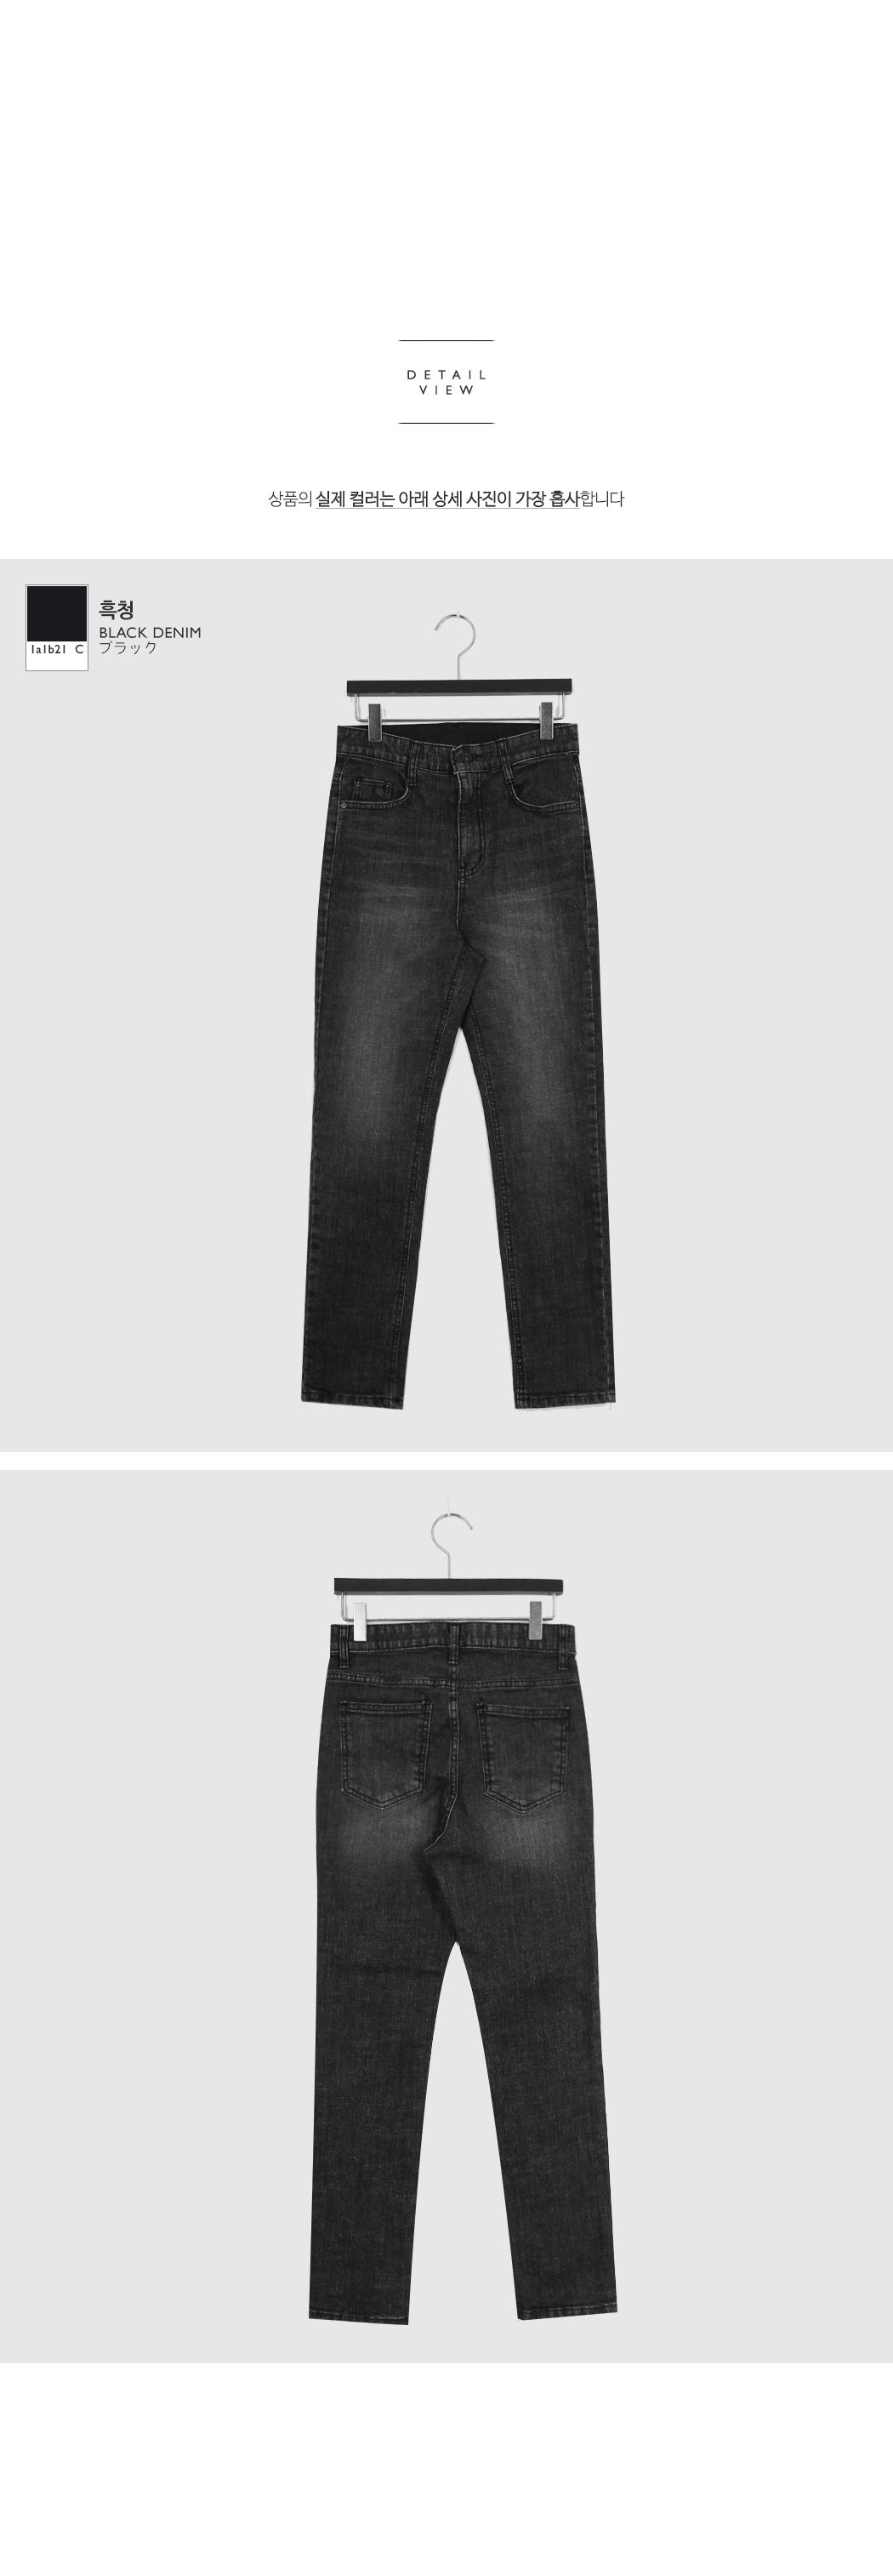 Dark Charcoal Straight Pants